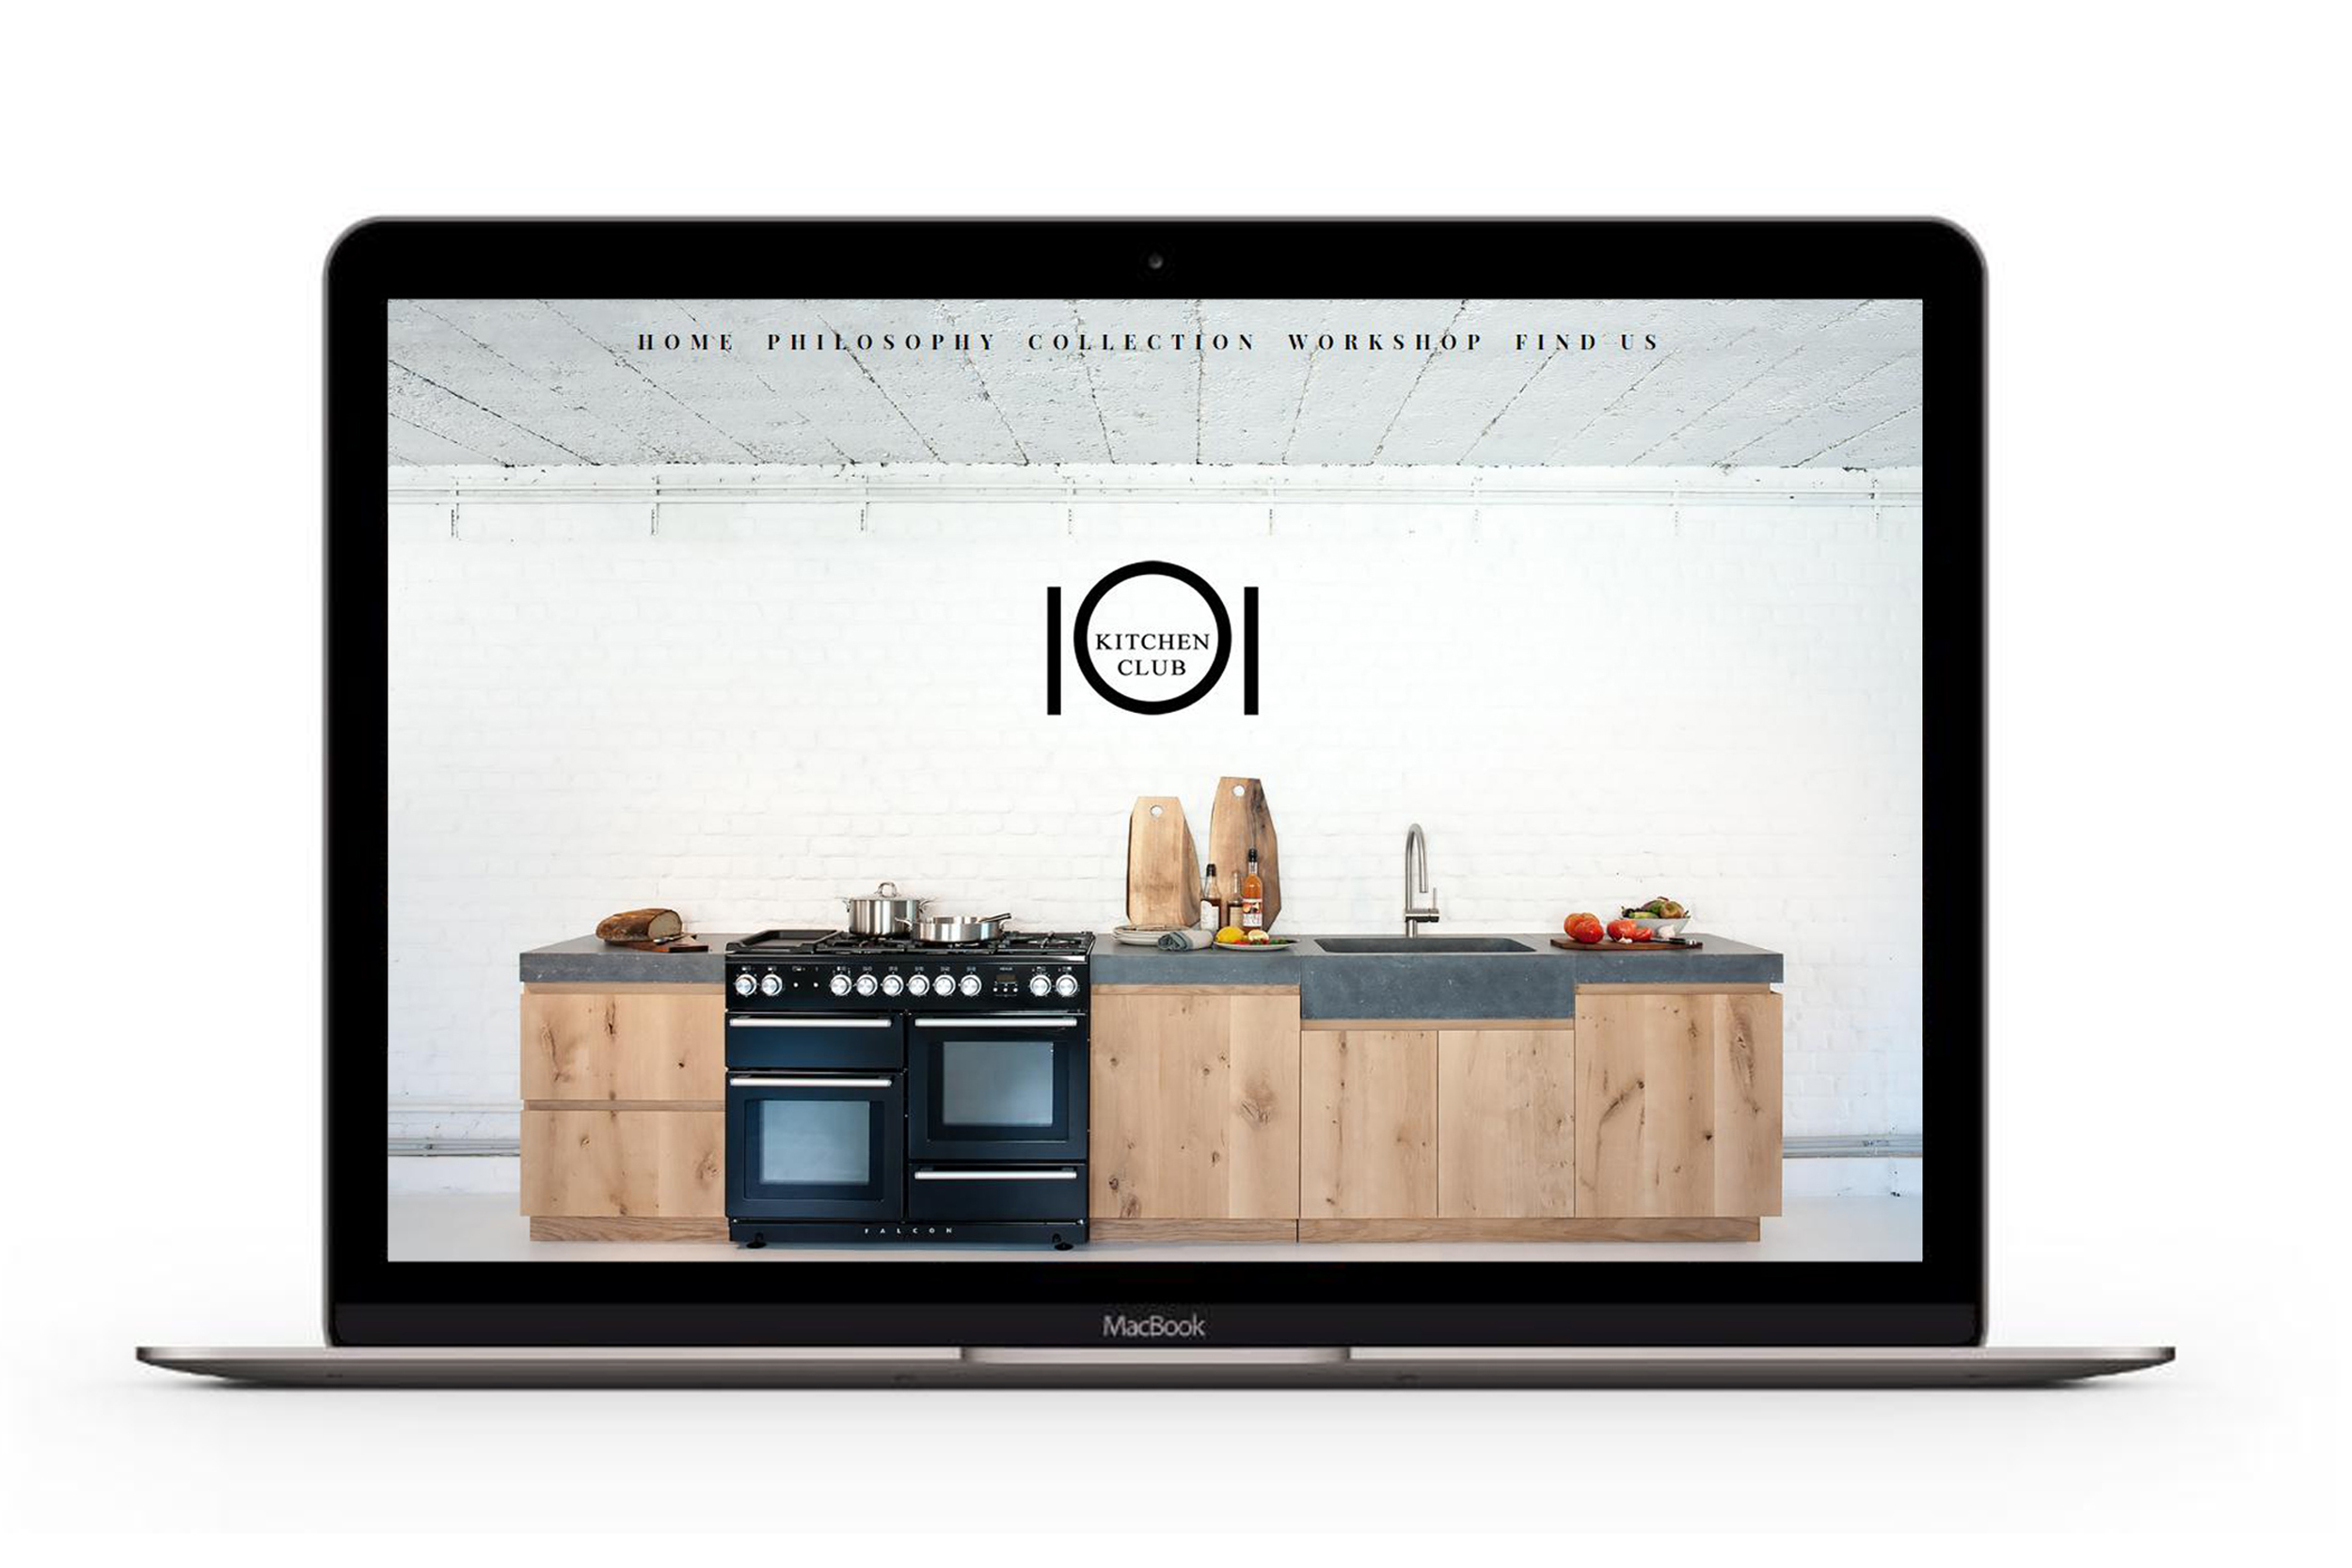 Kitchen Club-001 on screen LR.jpg